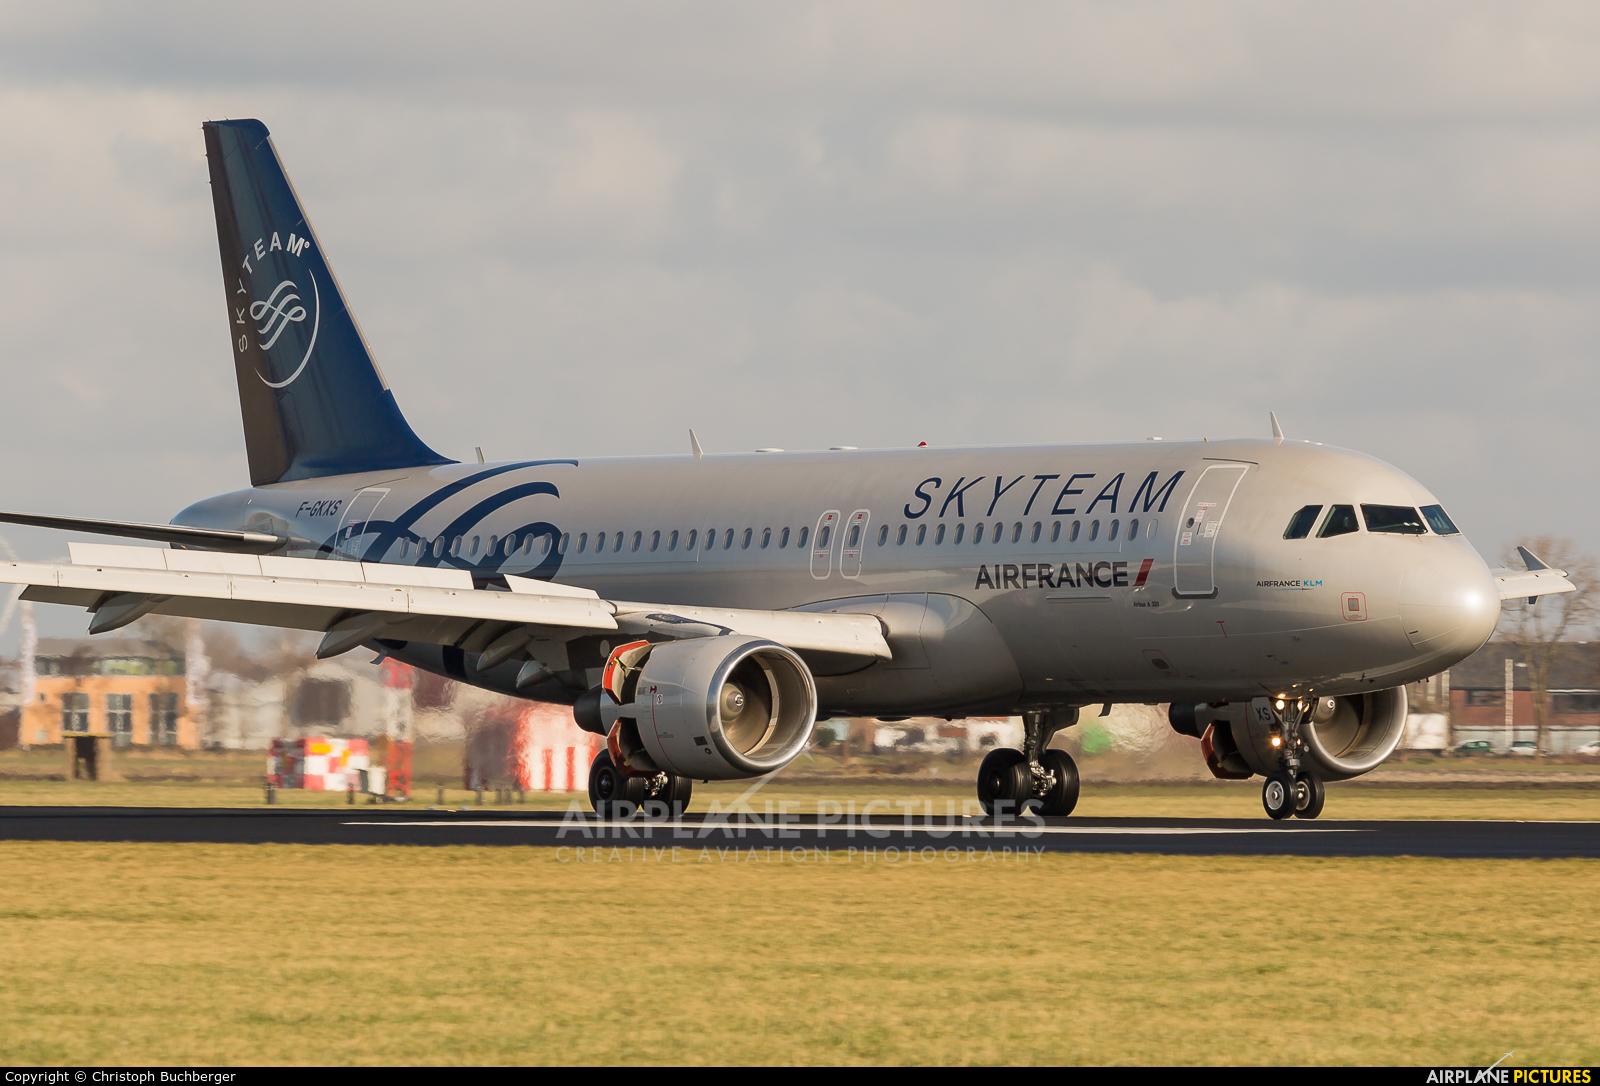 Air France F-GKXS aircraft at Amsterdam - Schiphol